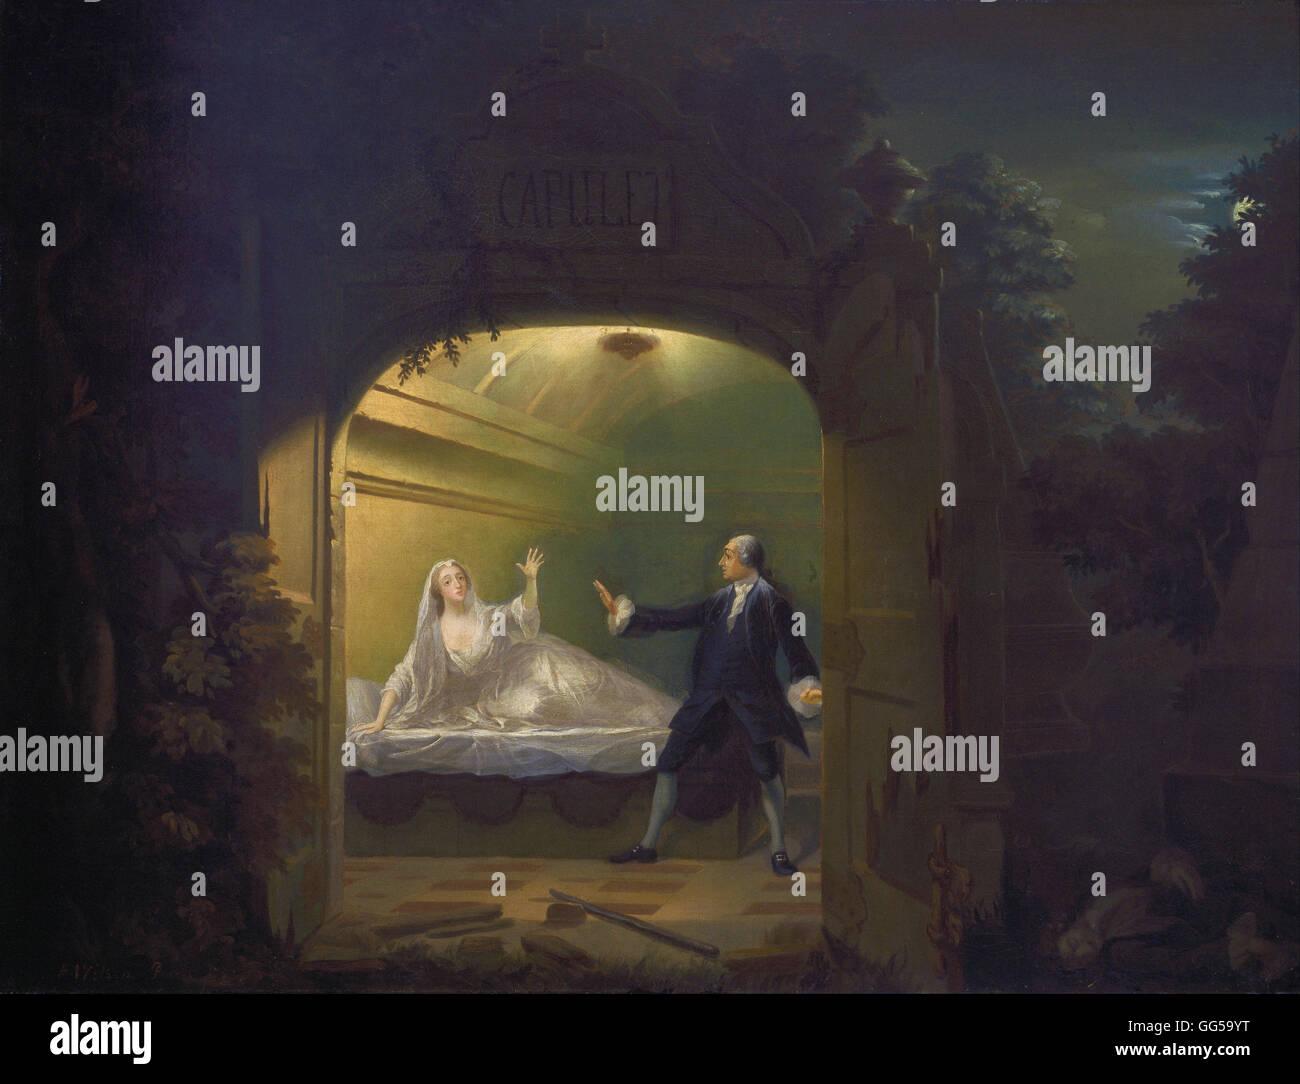 Benjamin Wilson - David Garrick and George Anne Bellamy in Romeo and Juliet, Act V, Scene III - Stock Image